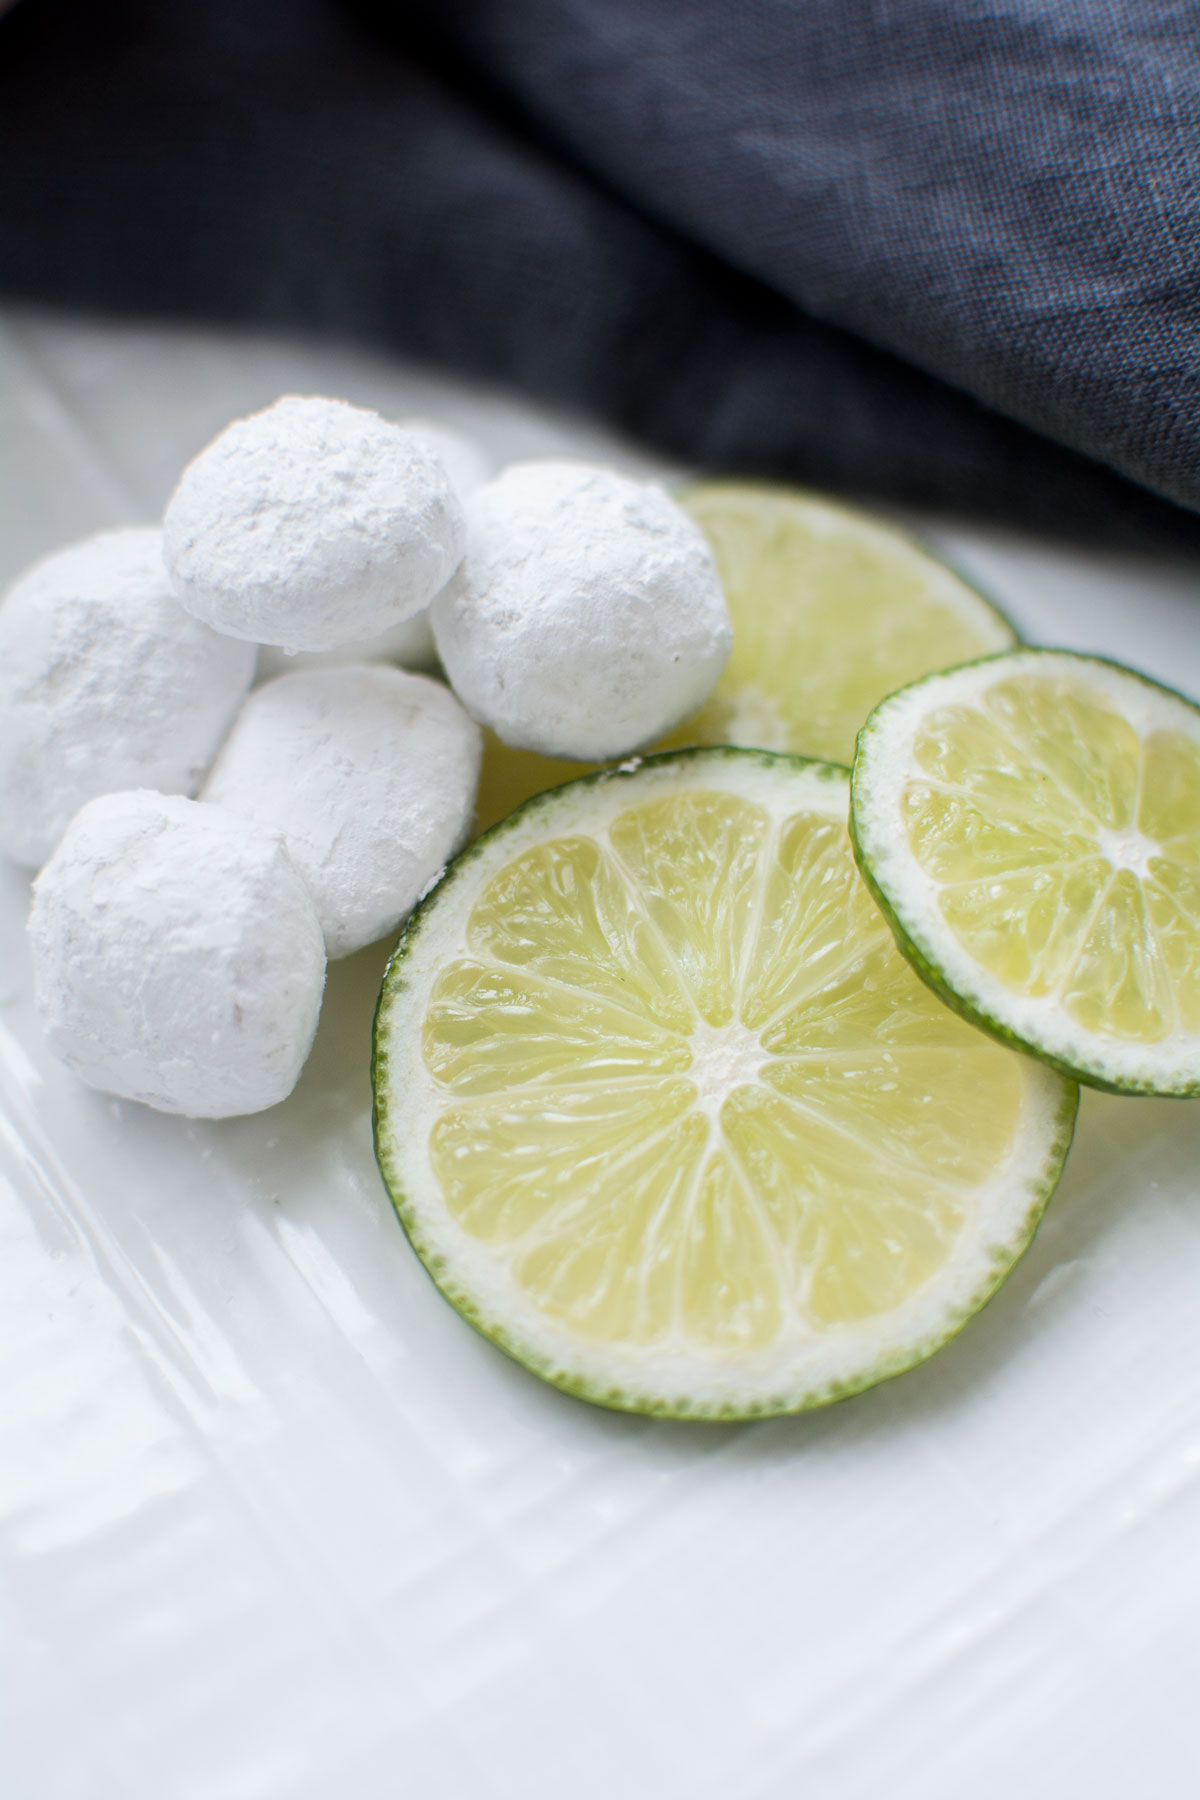 Ingredients: Flour, Butter, Sugar, Almonds, Dextrose, Lemon Emulsion, Salt, Natural Flavor.